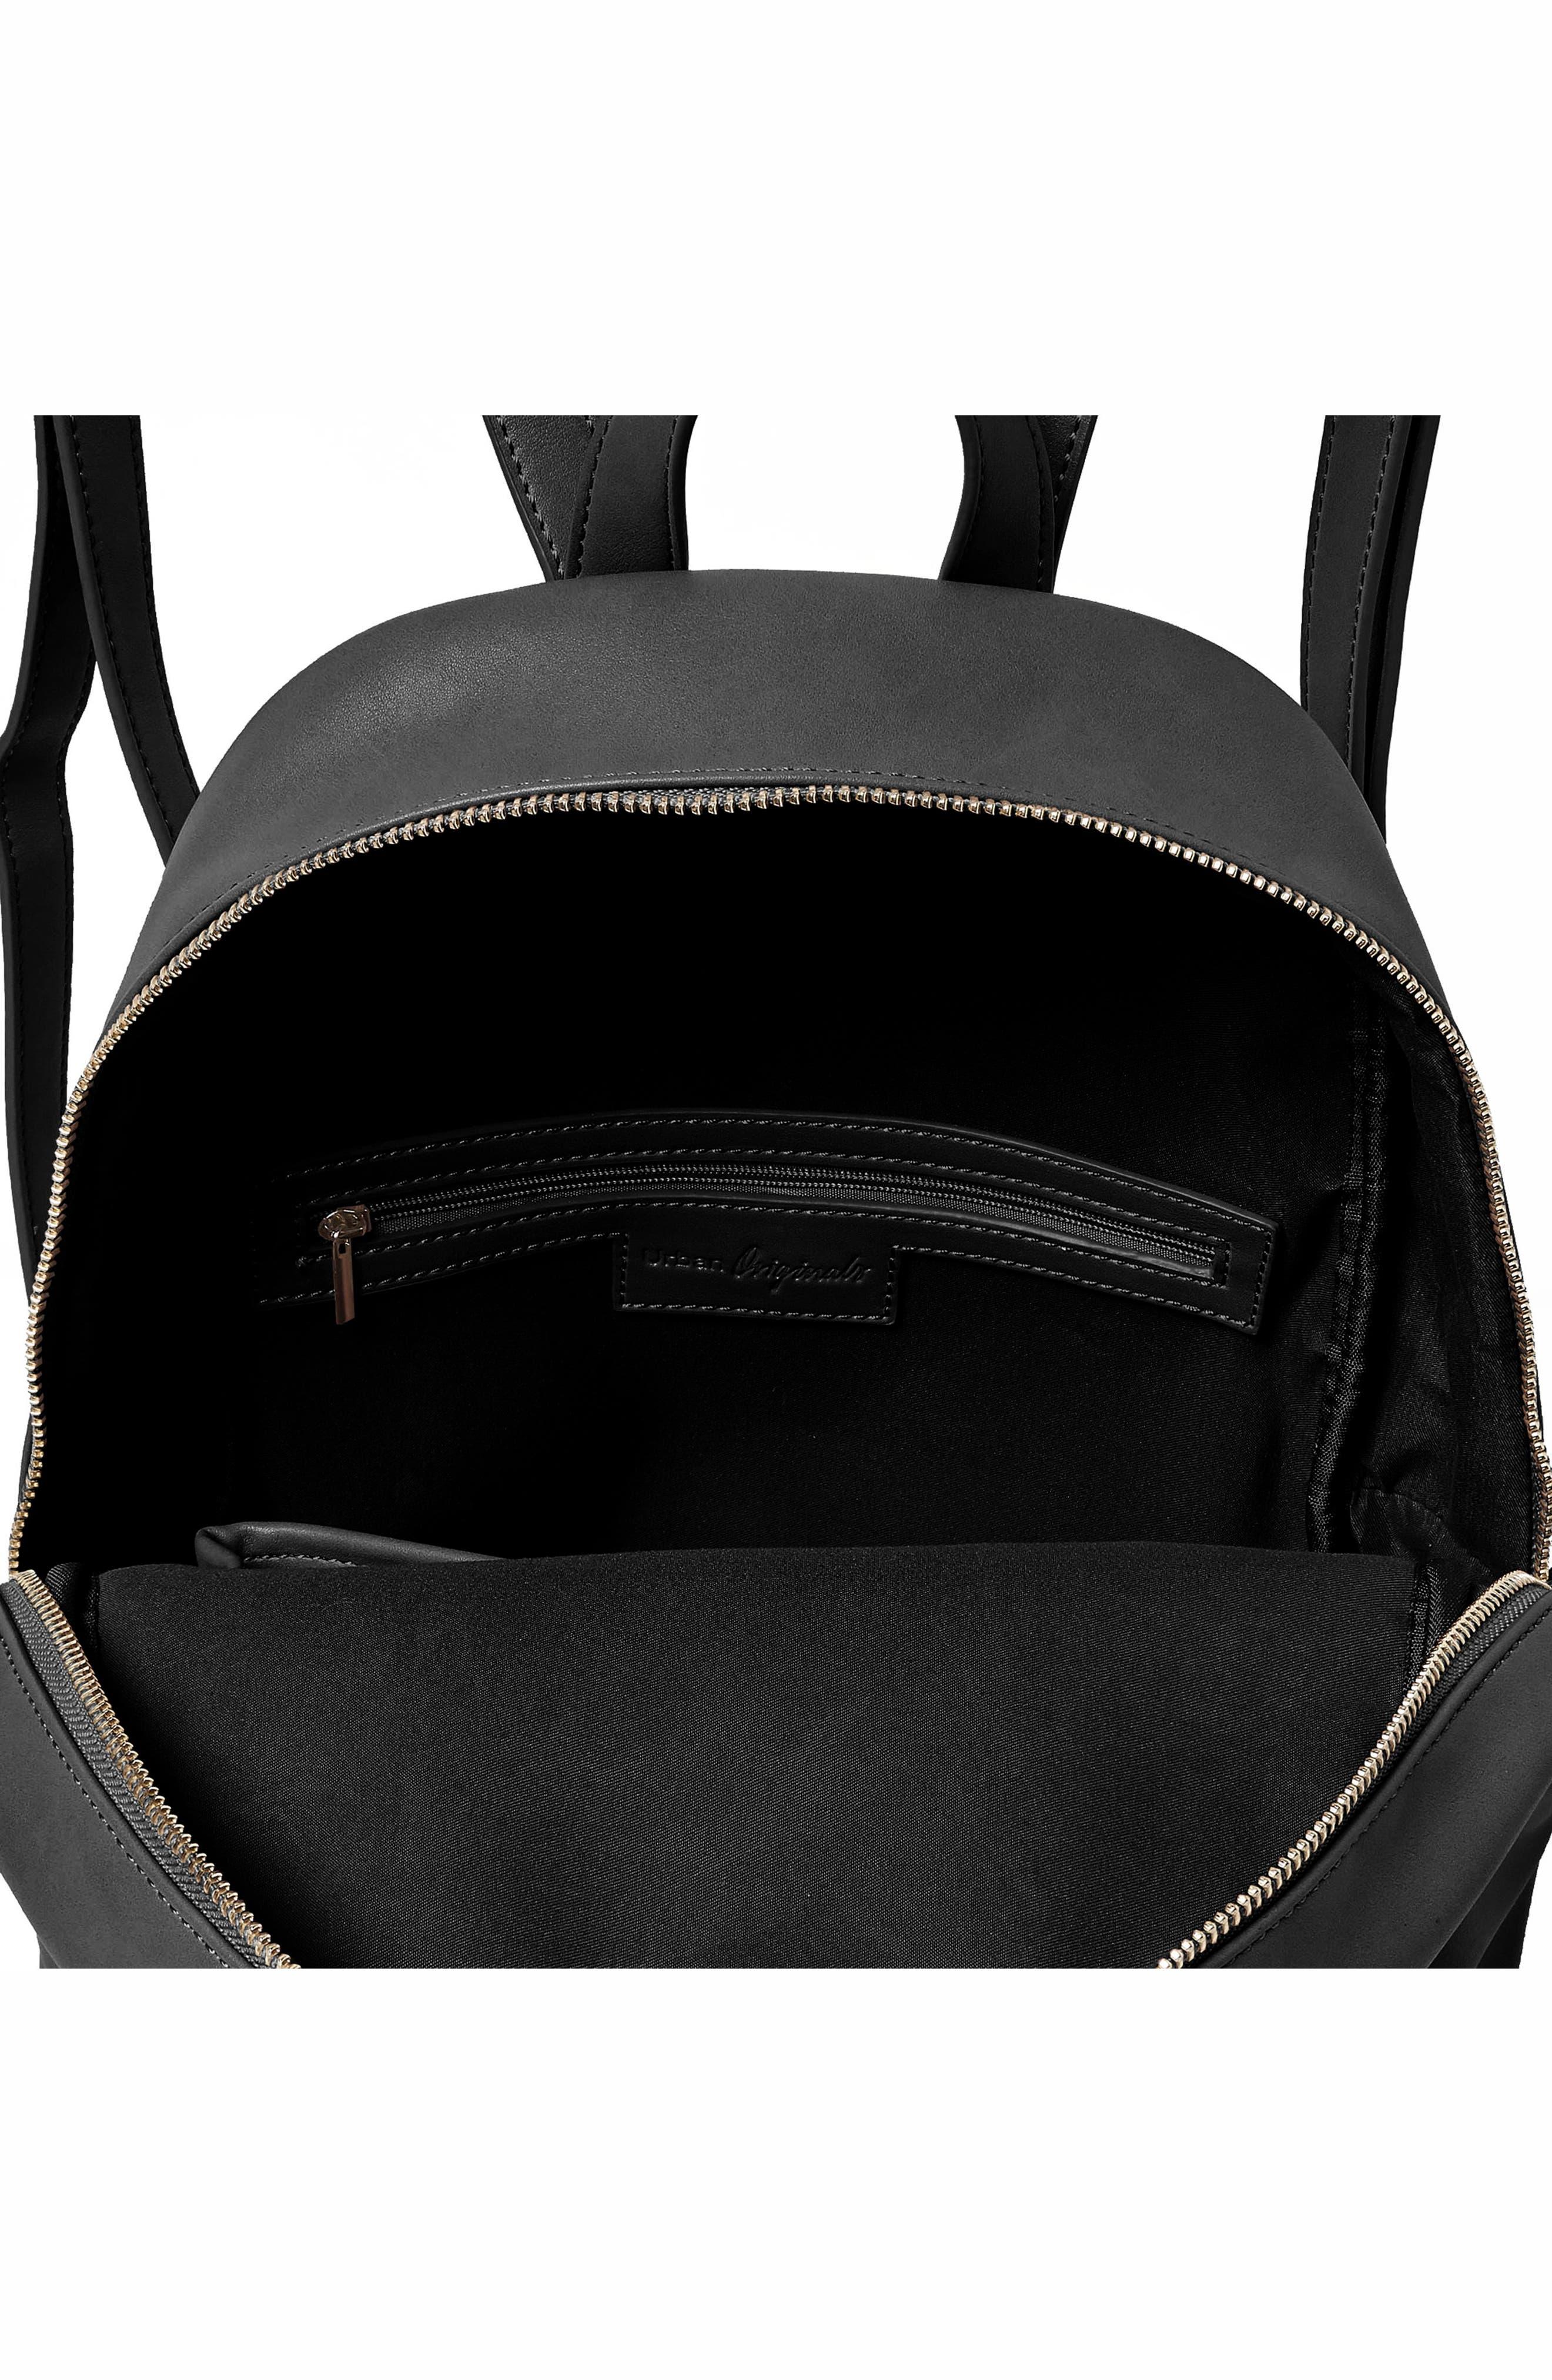 Sublime Vegan Leather Backpack,                             Alternate thumbnail 3, color,                             001